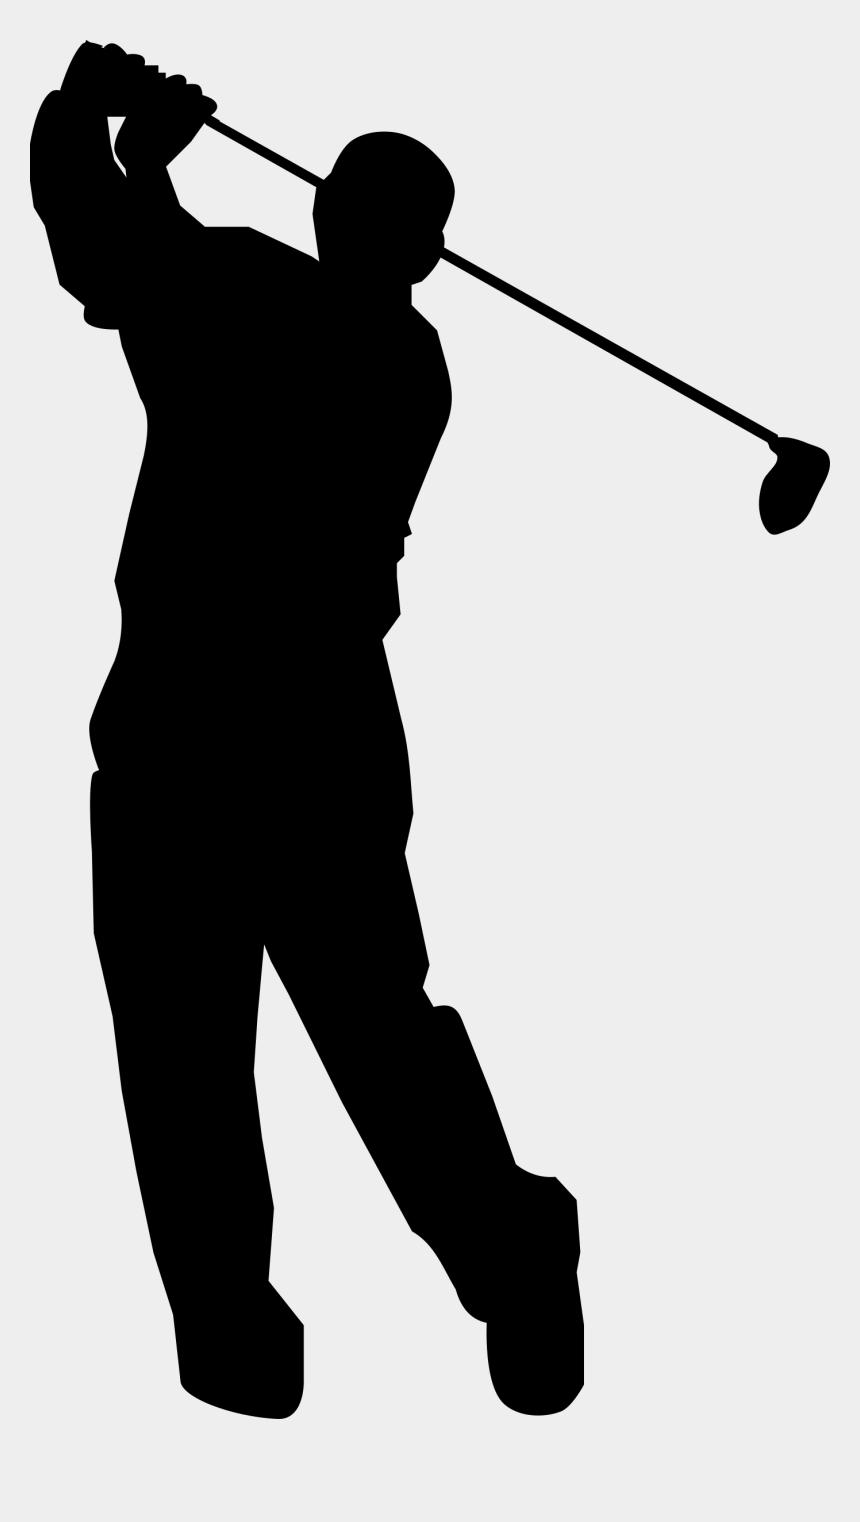 golf club clip art, Cartoons - Golf Ball Png - Golfer Clipart Black And White